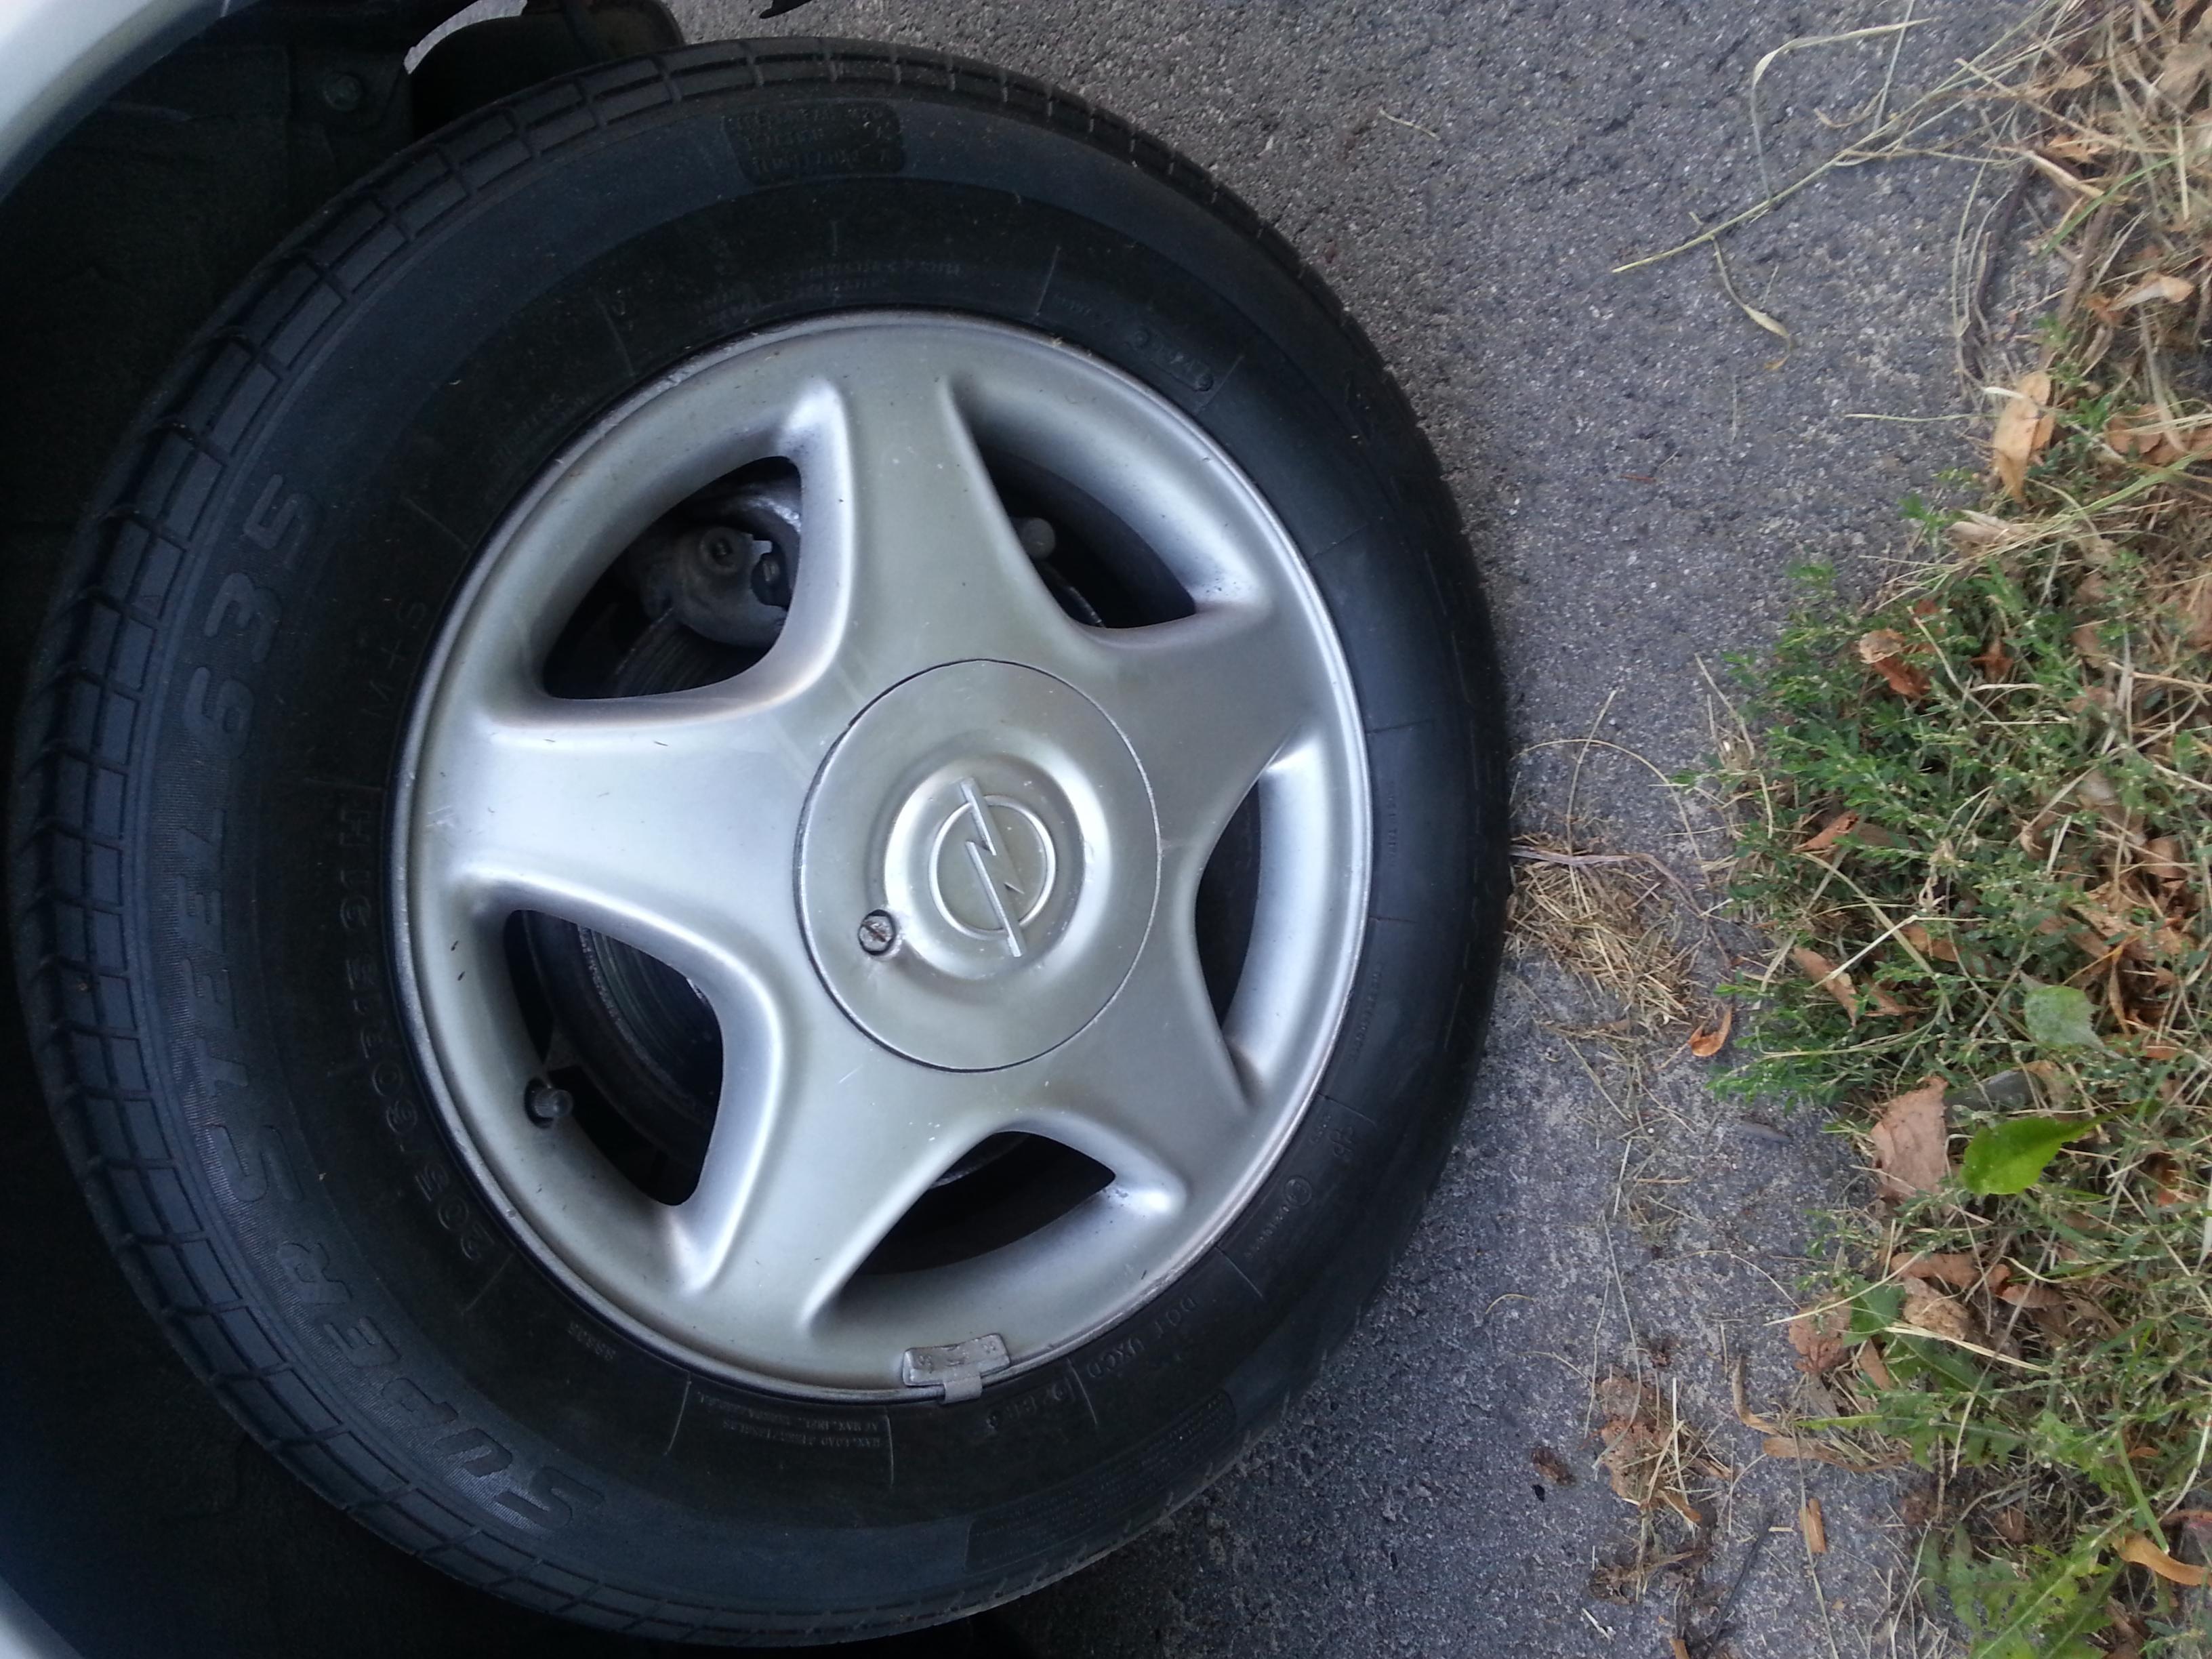 [Kupi�] Dekielek alufelgi Opel Astra G.